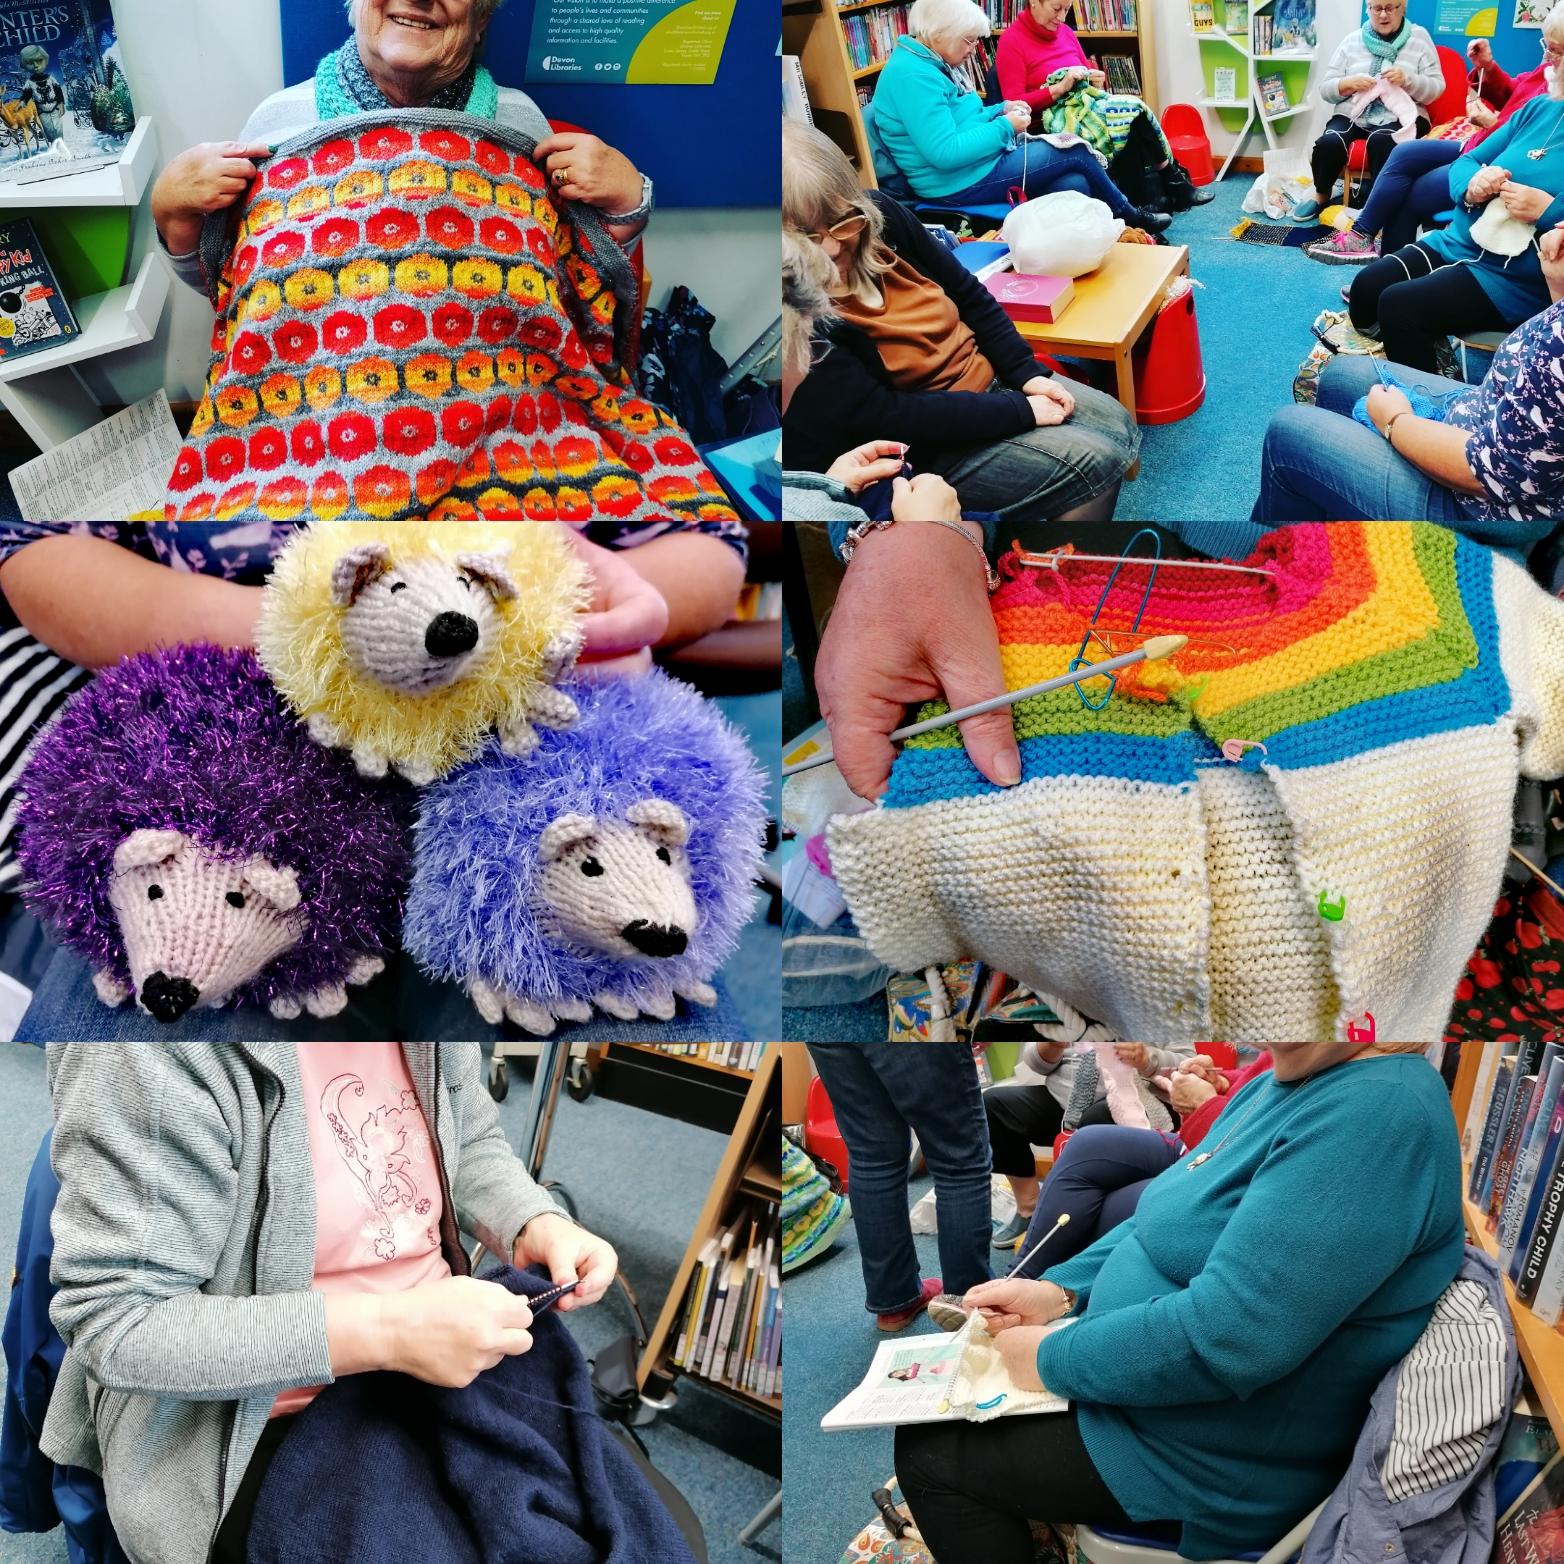 Hedgehogs, crochet, colour, crafts, caring,